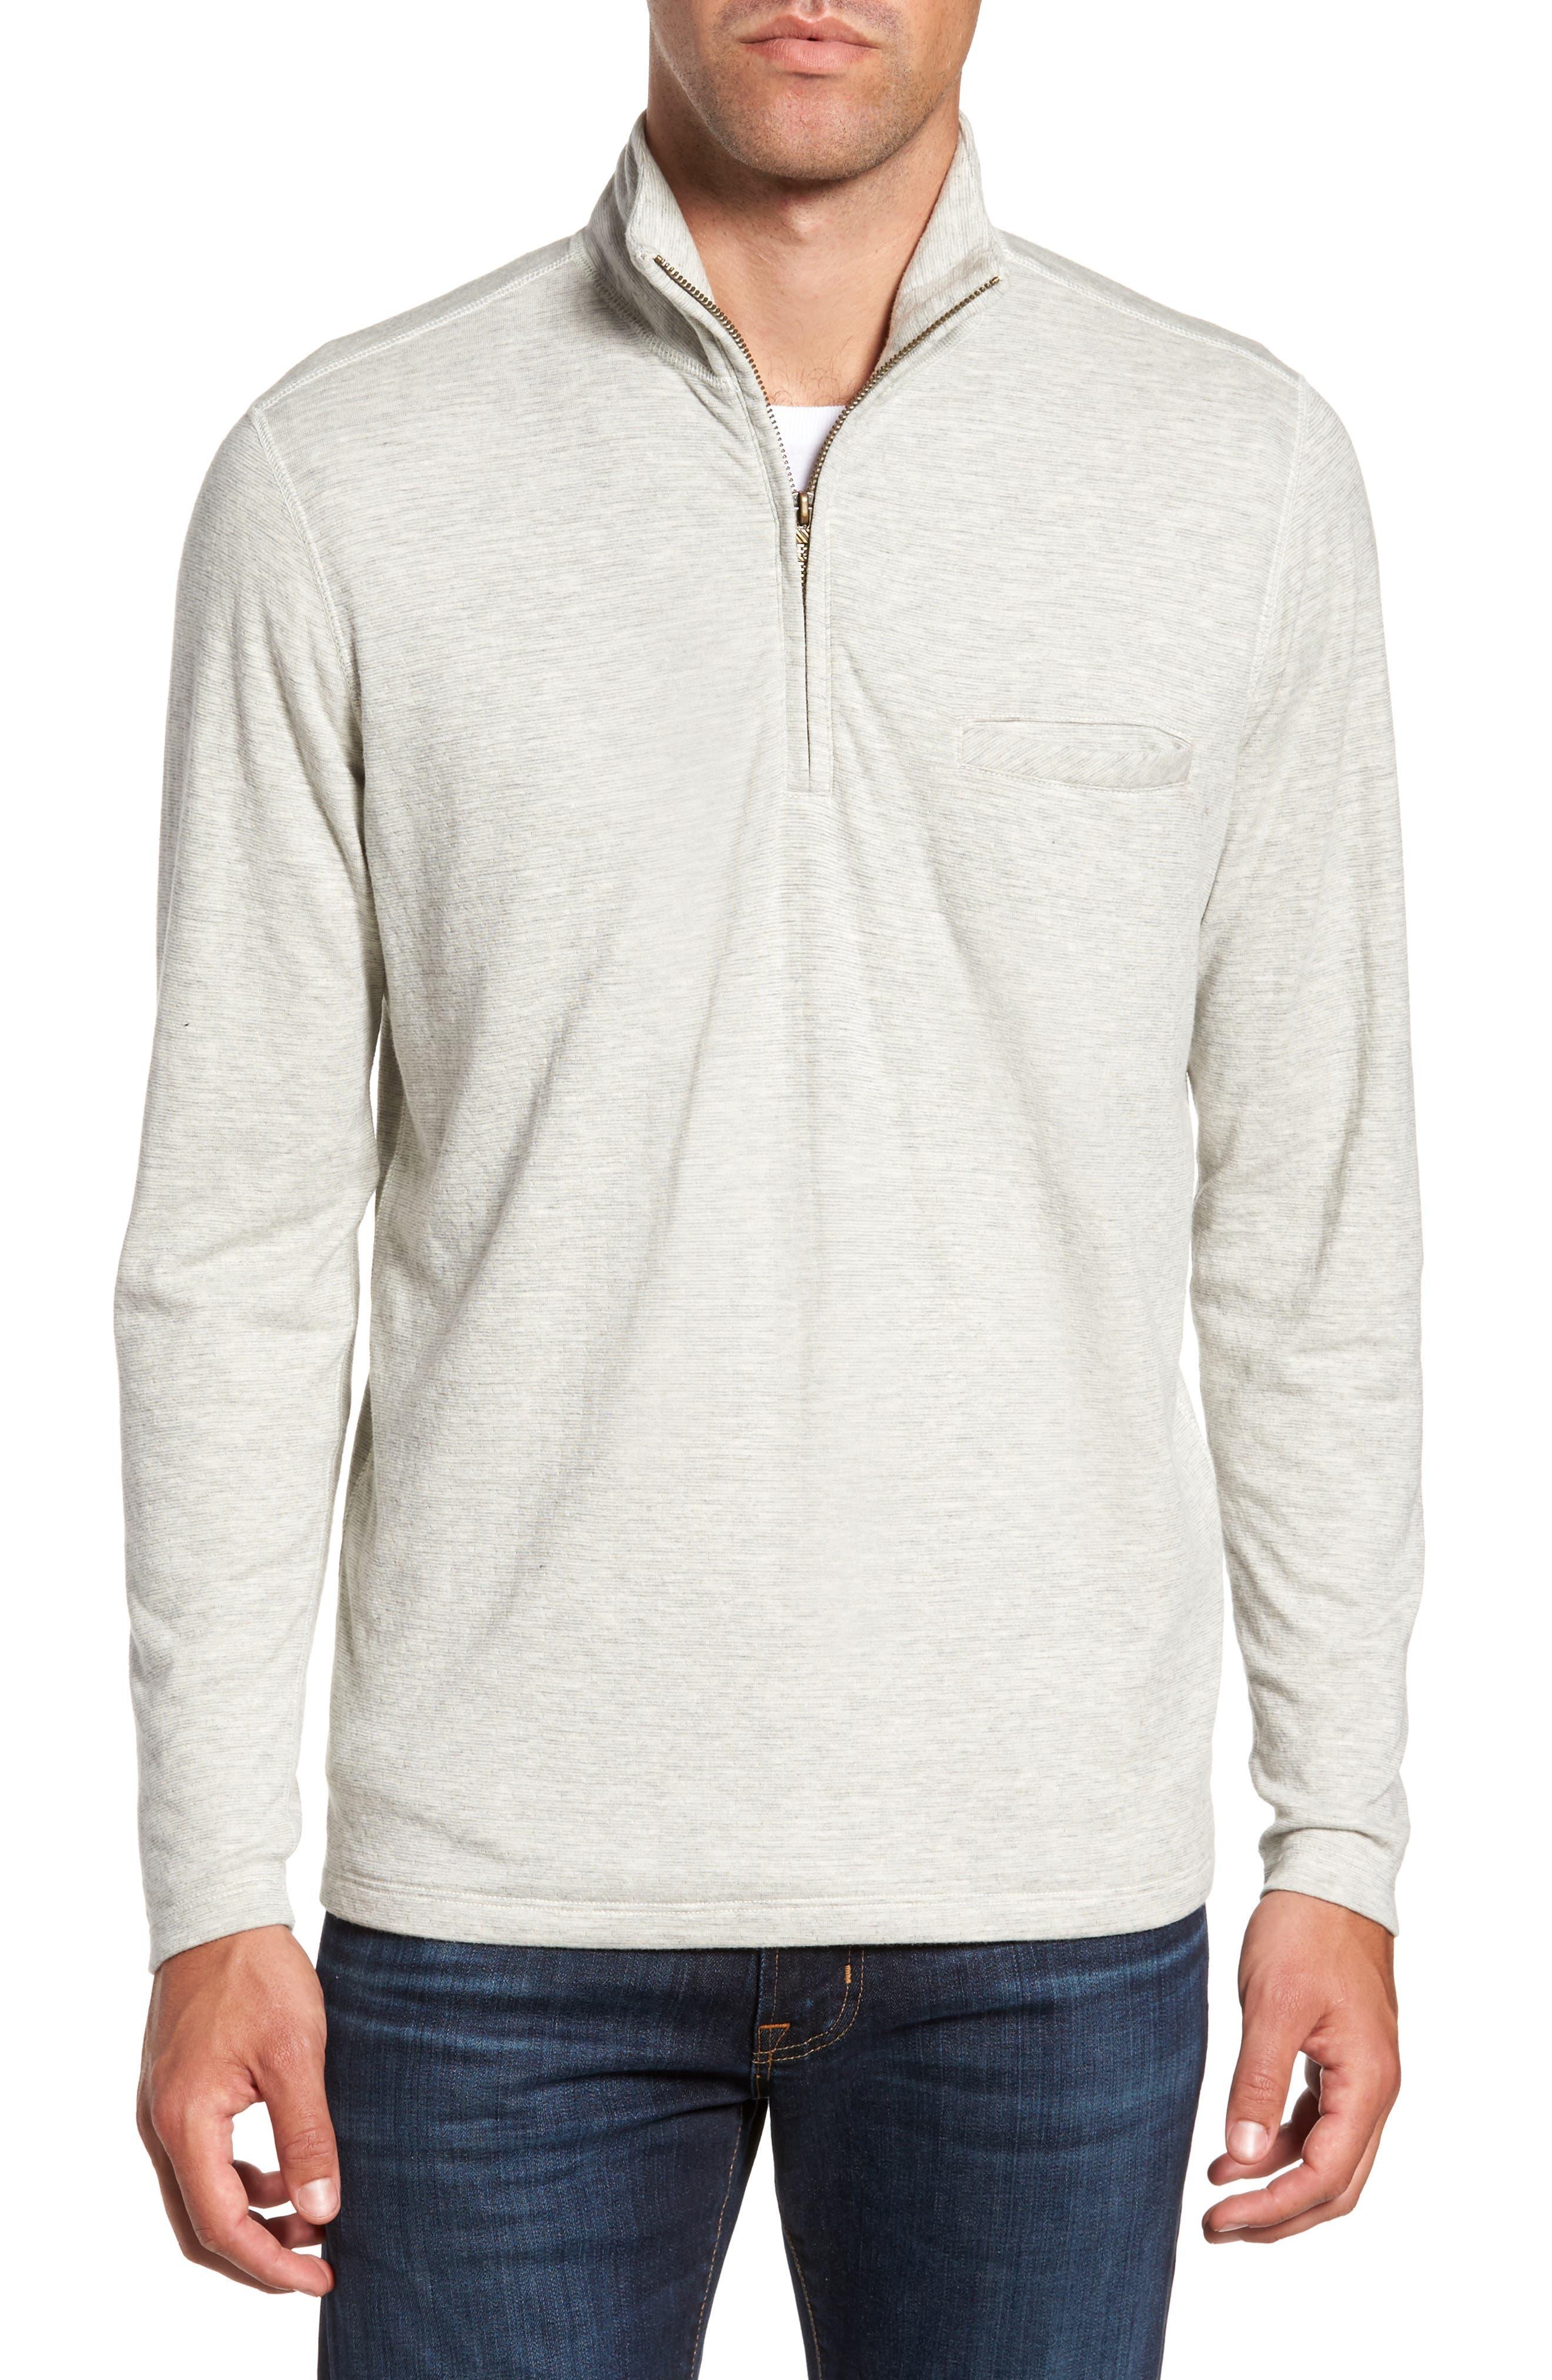 Main Image - Billy Reid Jordan Quarter Zip Pullover